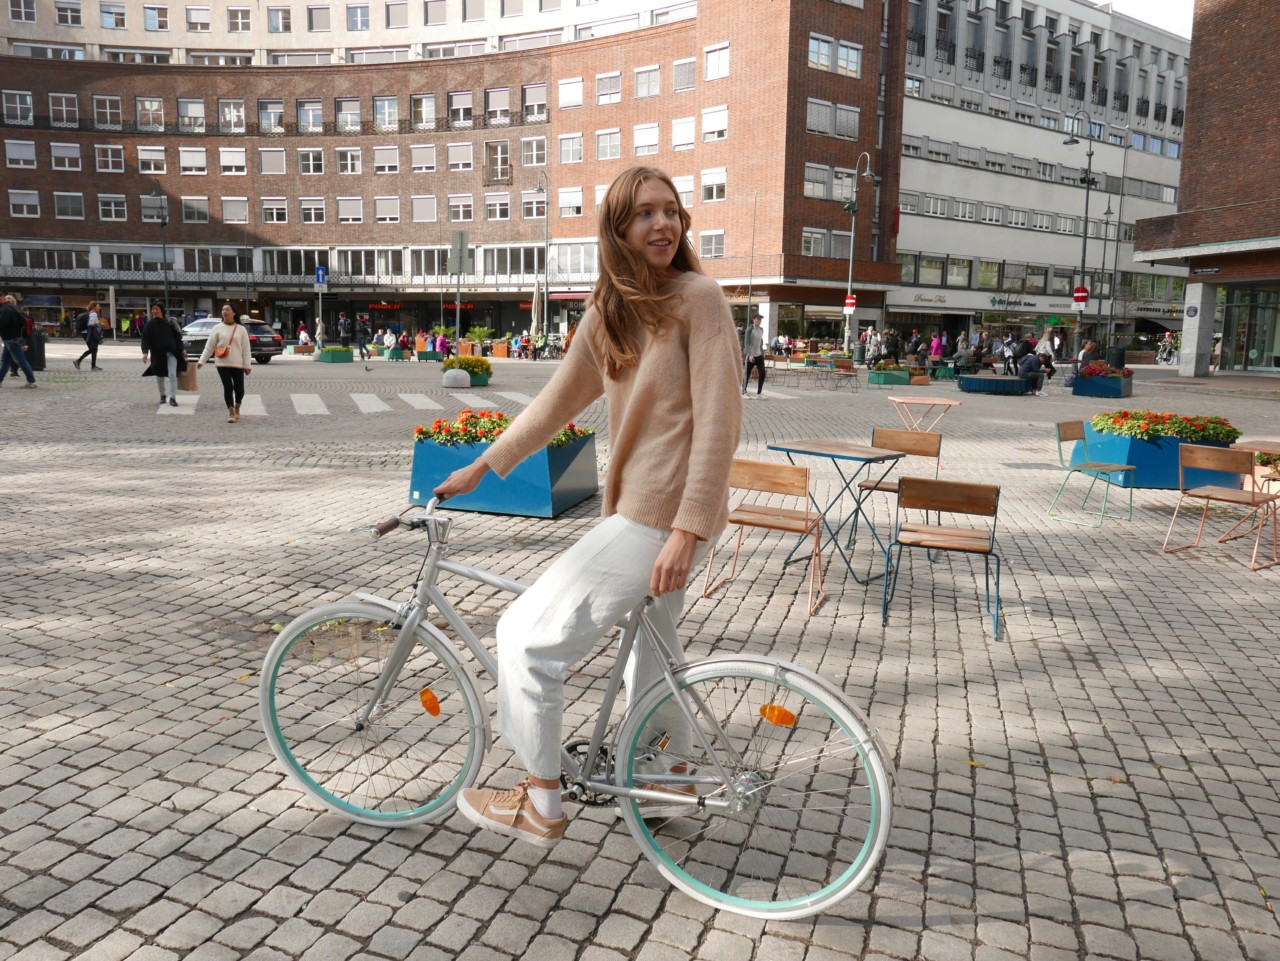 bysyklist-girl-on-bike